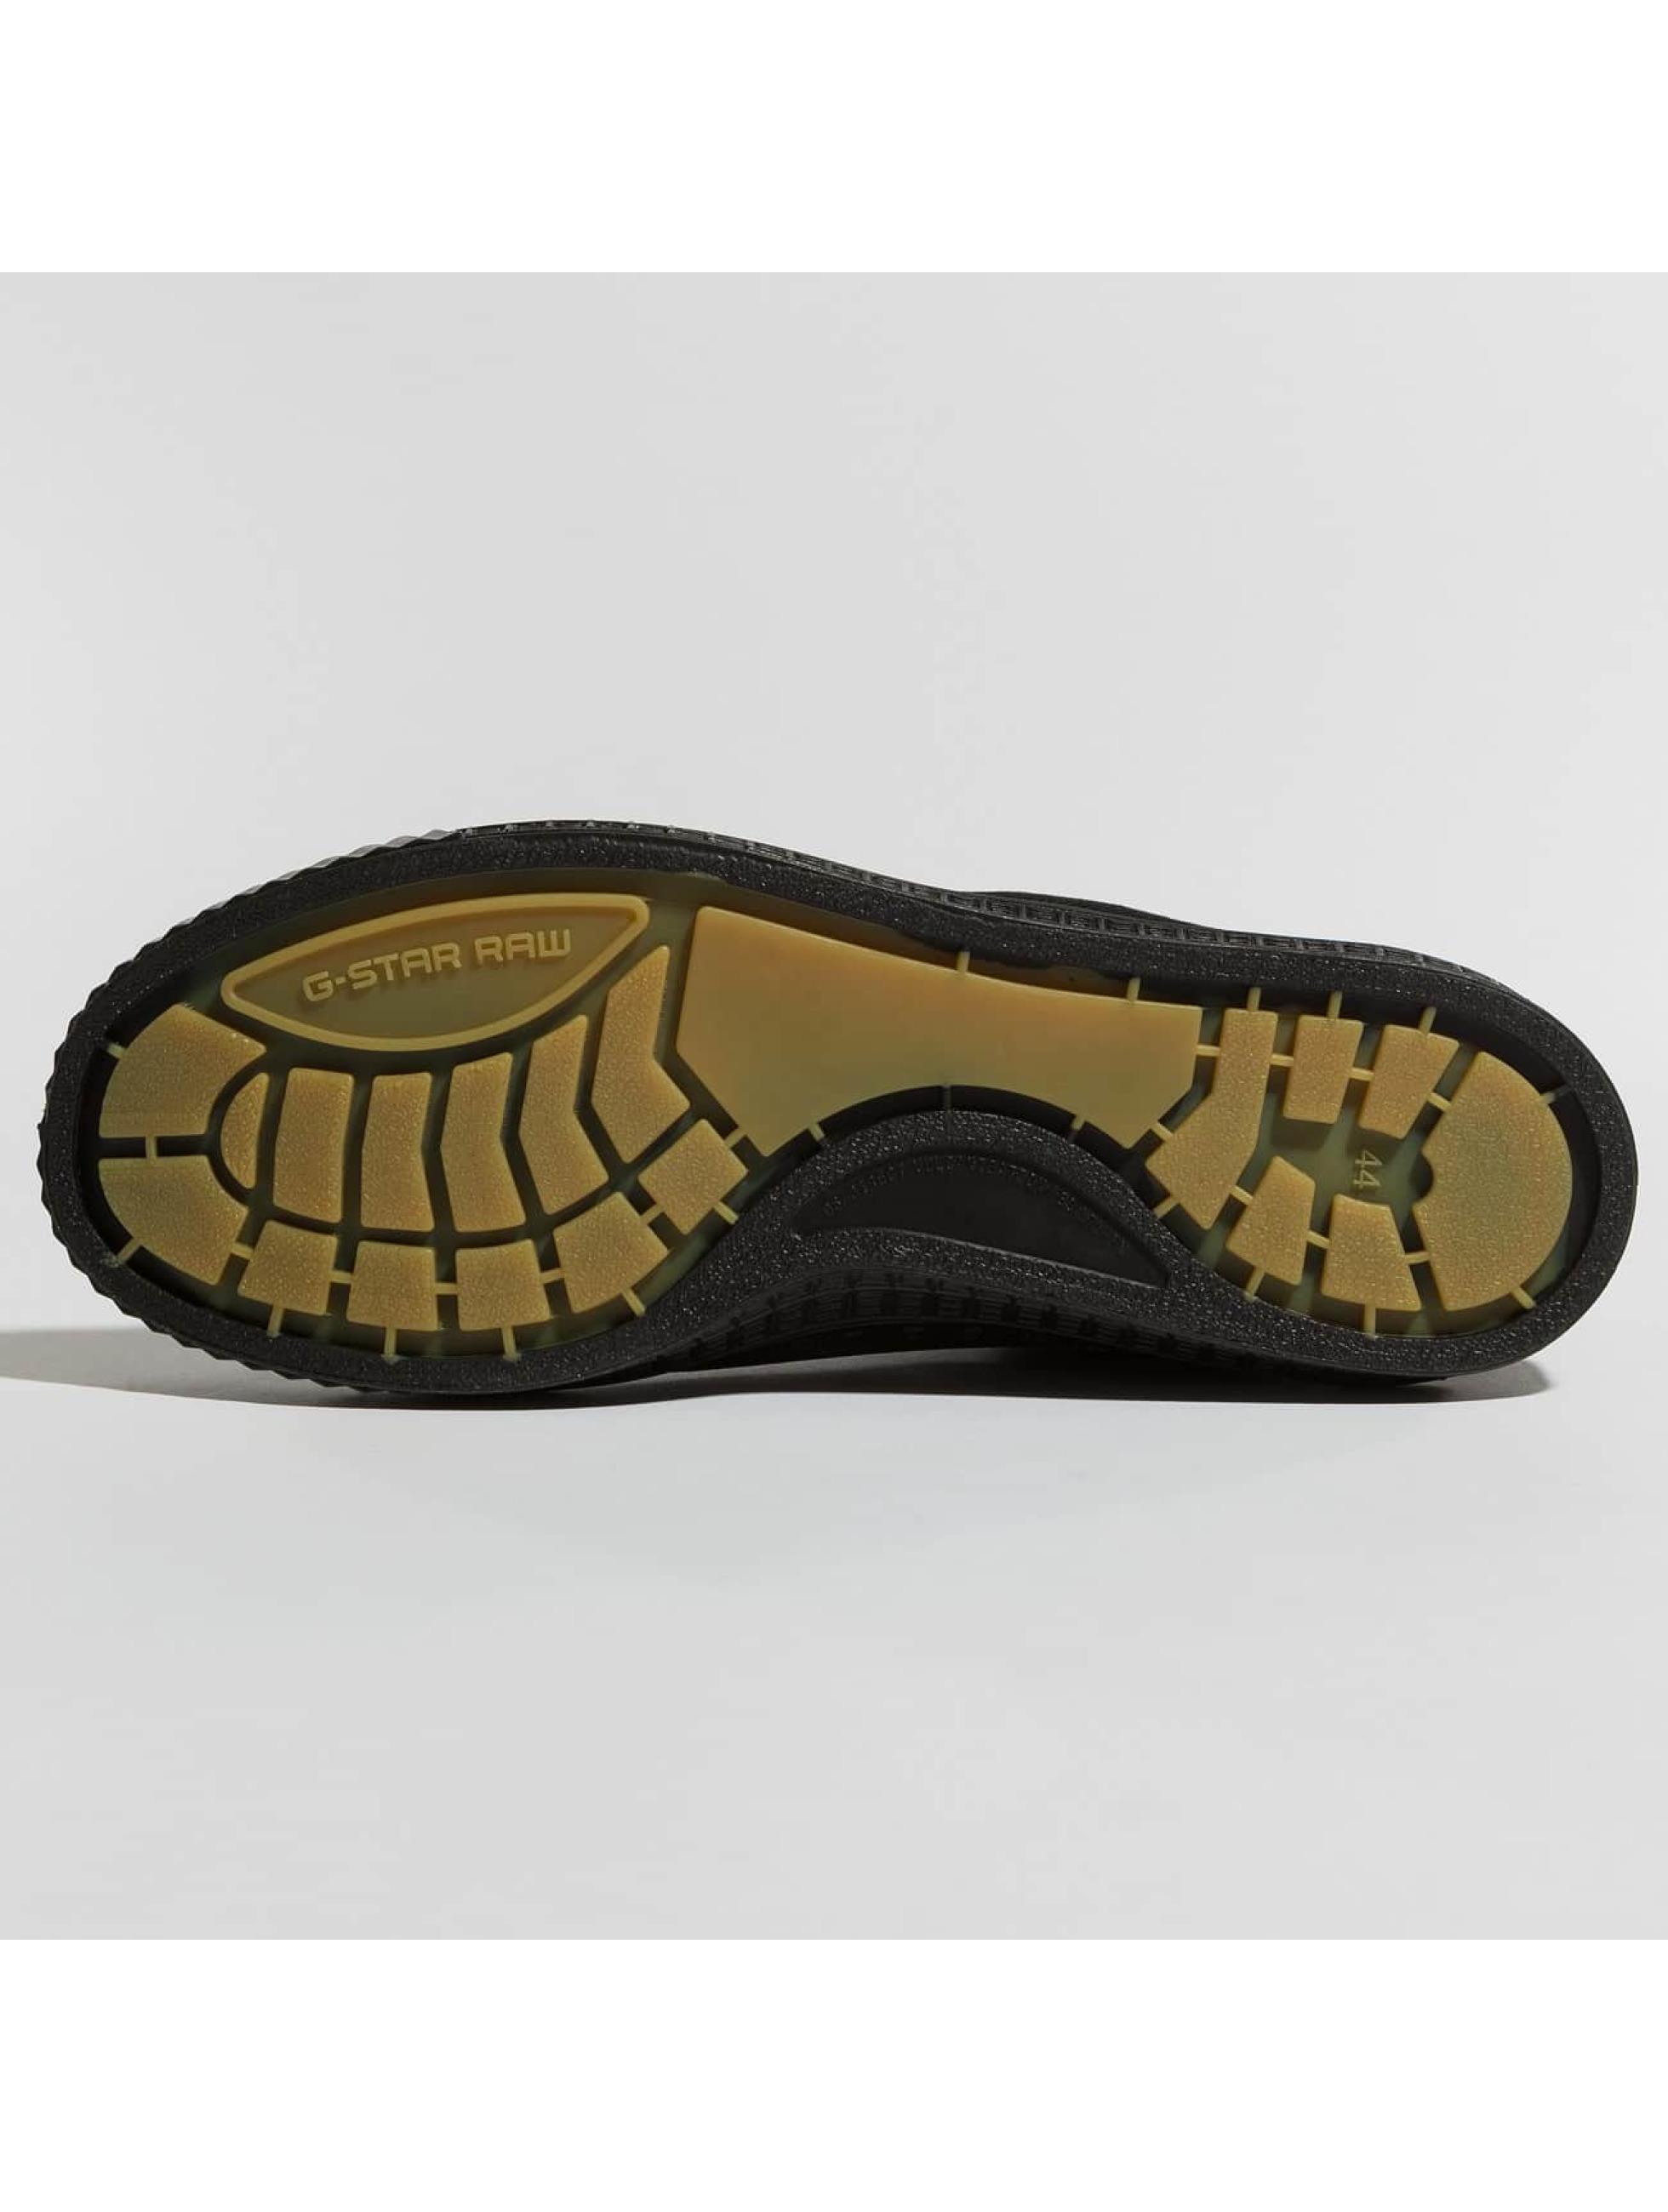 G-Star Footwear Tennarit Rovulc HB Mid musta